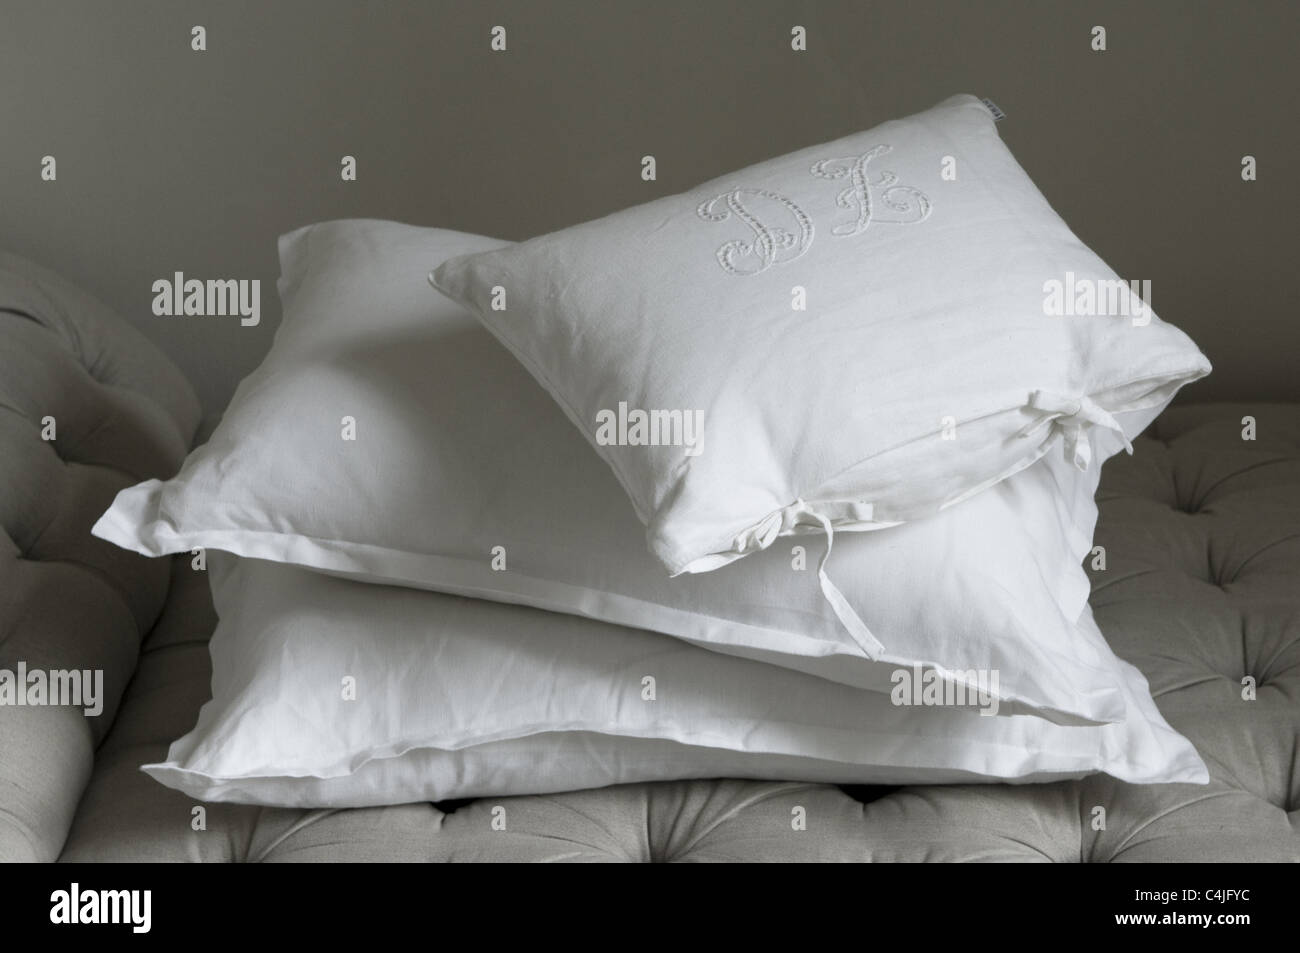 cushions - Stock Image